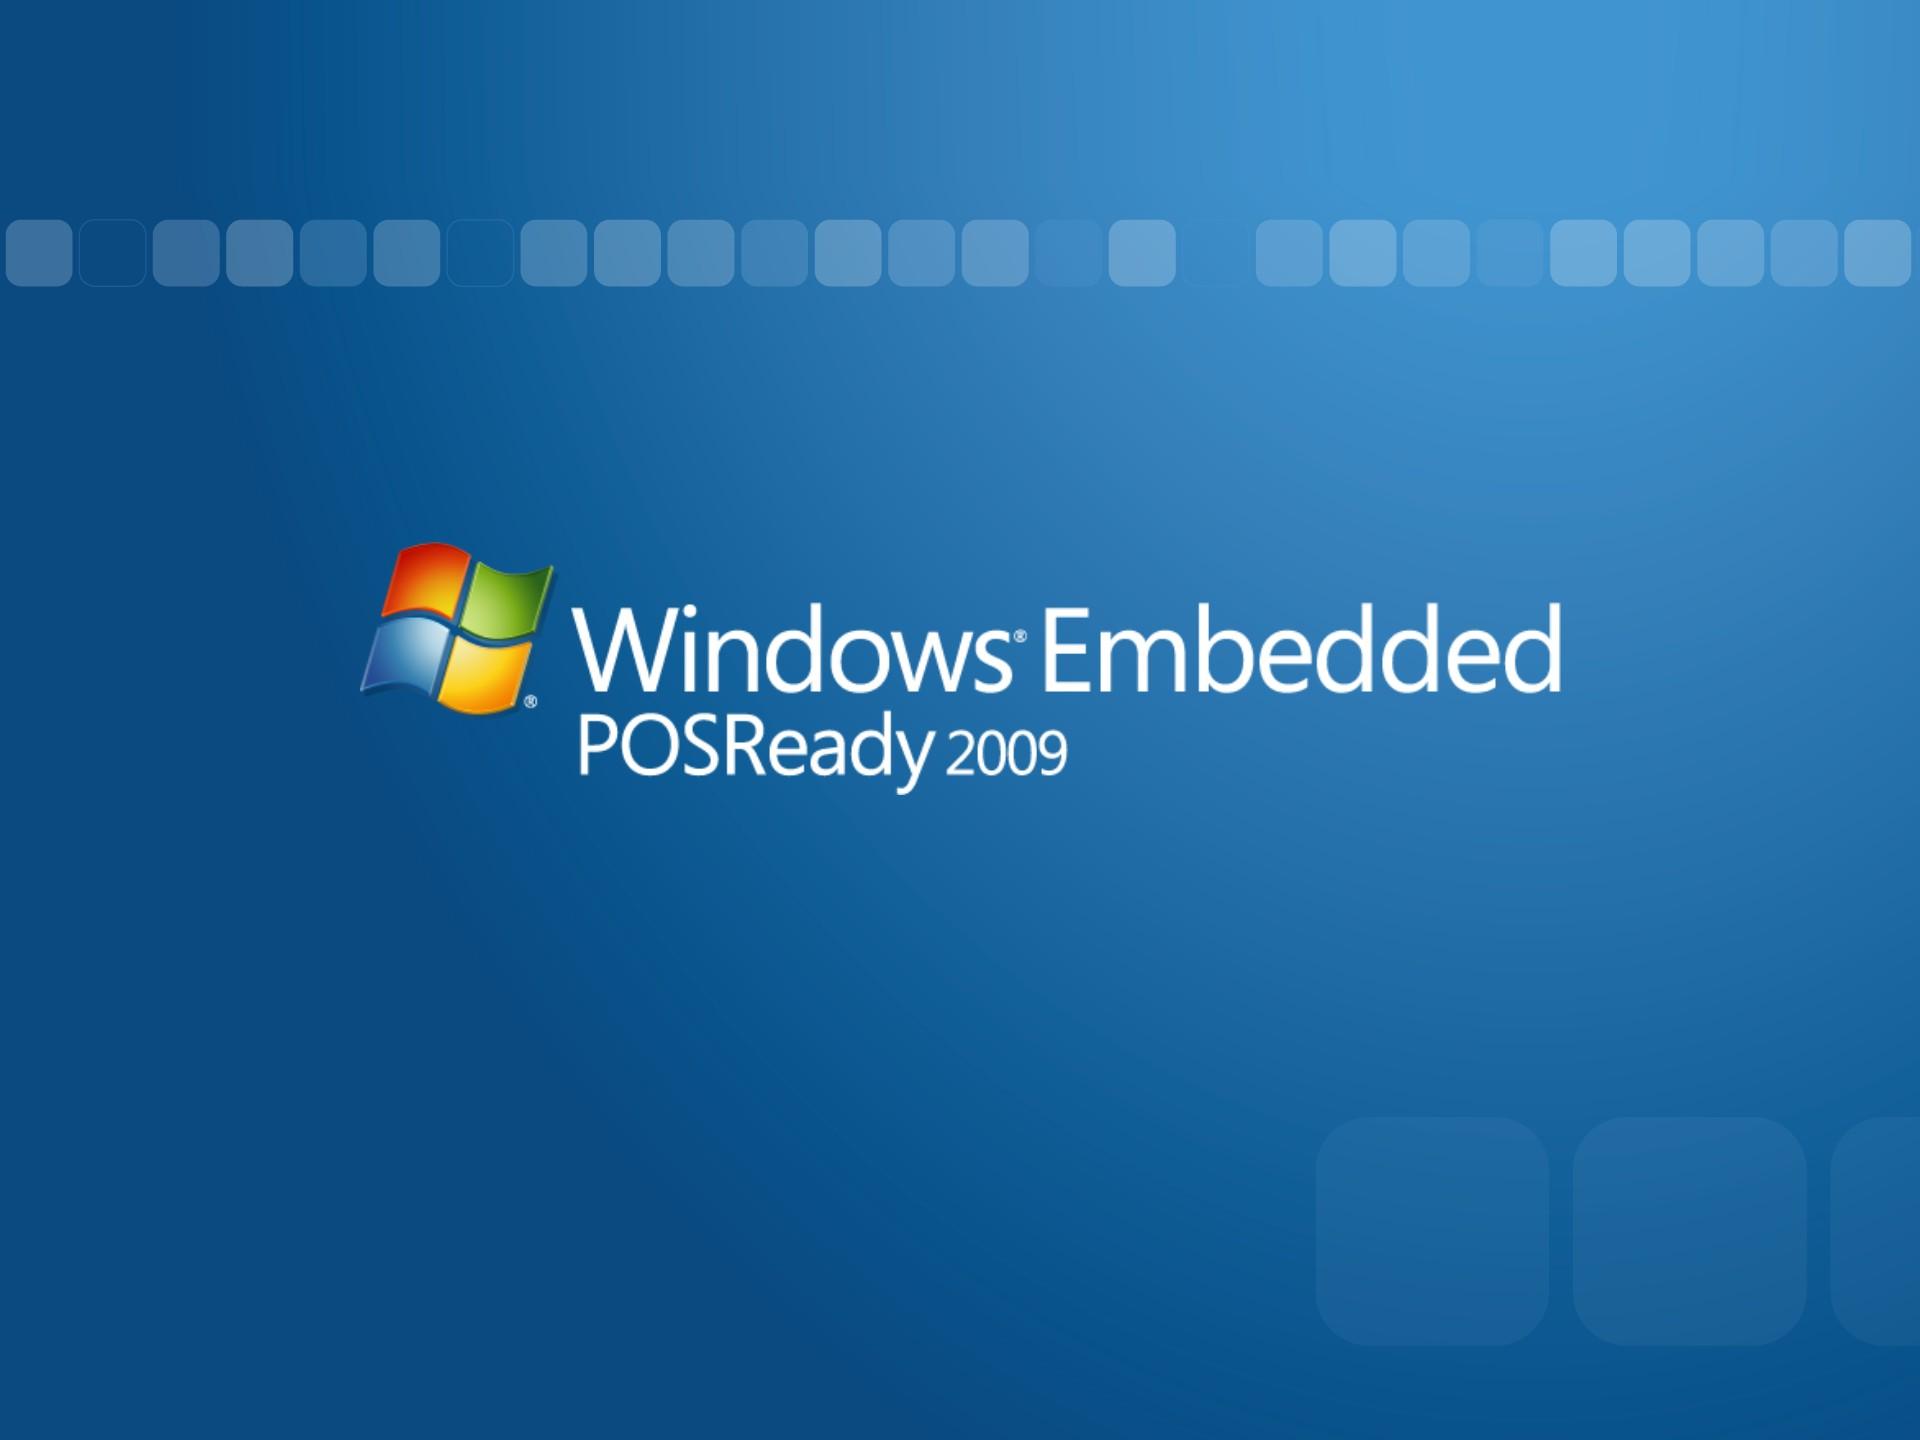 Windows embedded posready 2009 key generator